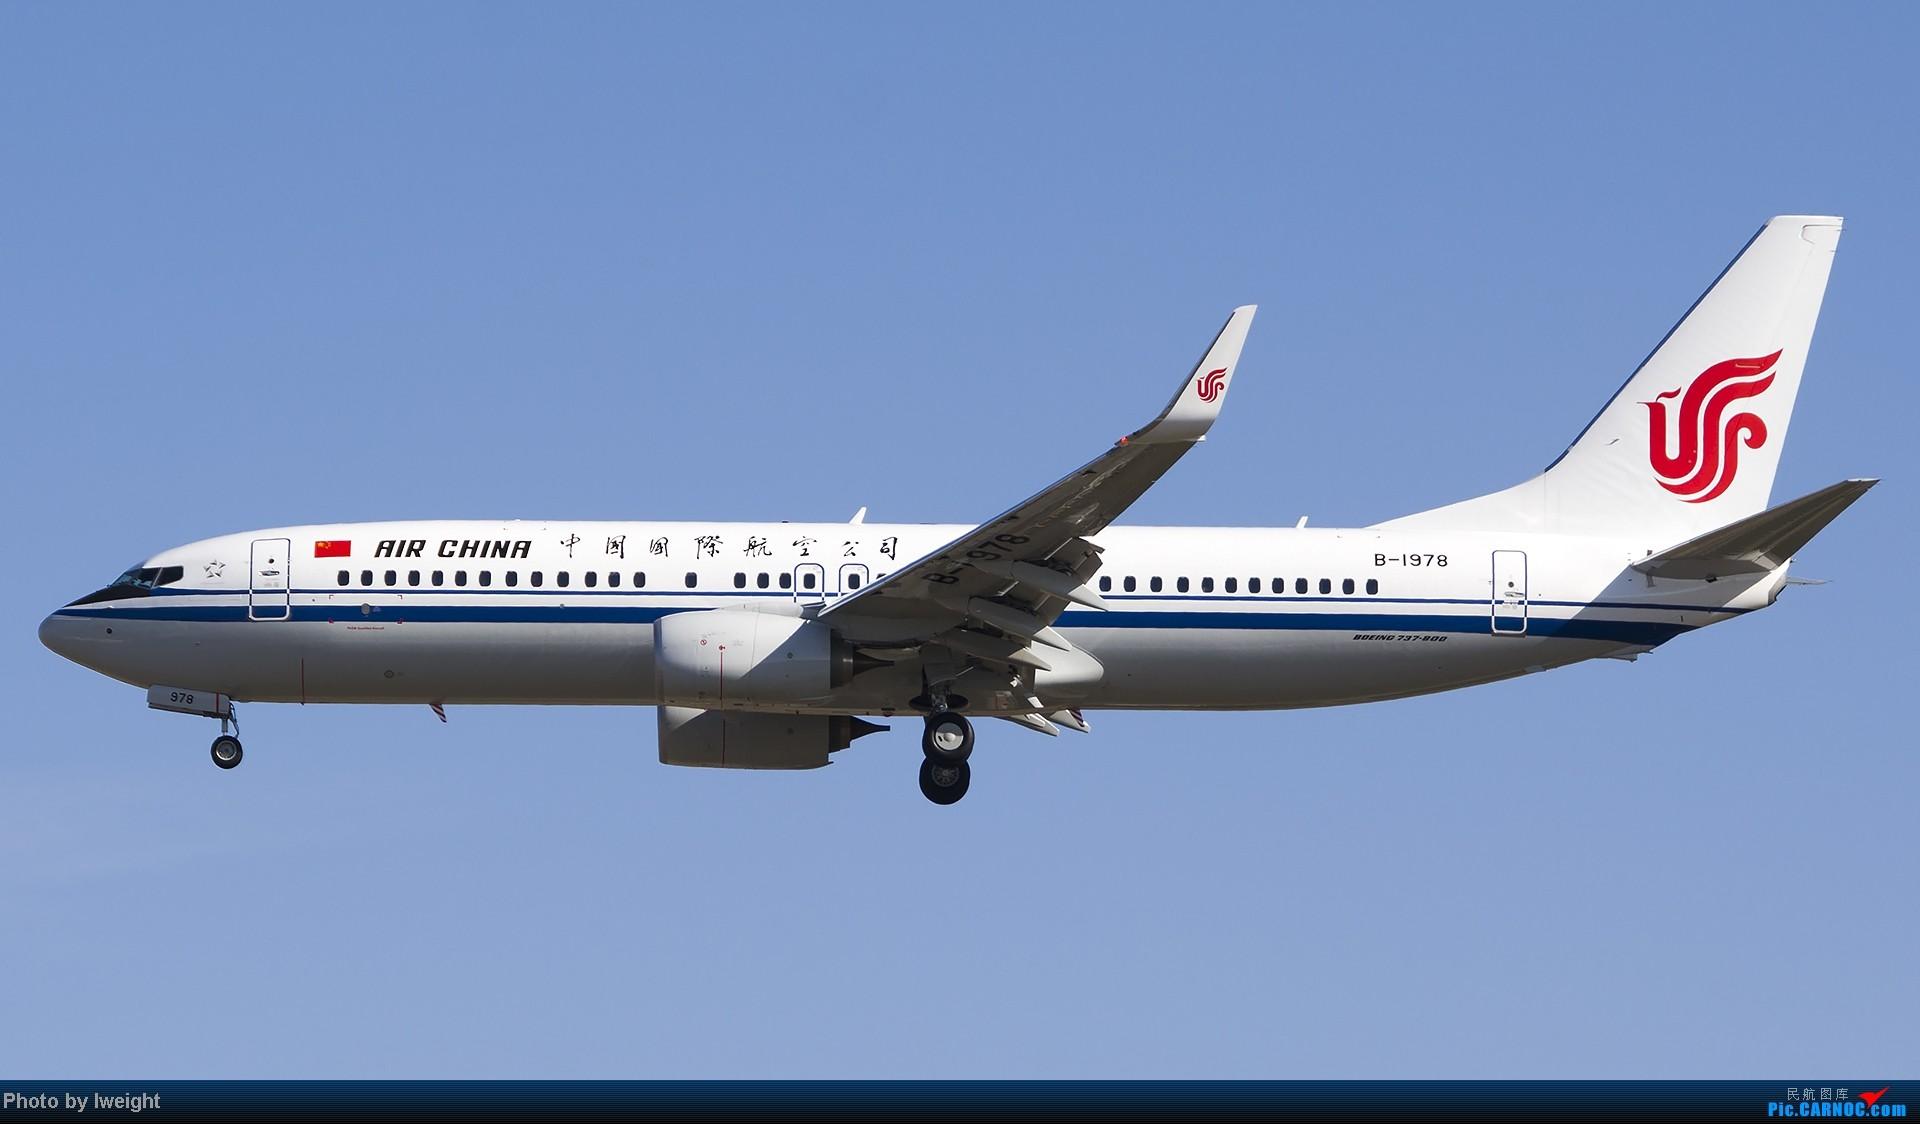 Re:[原创]抓住APEC蓝的尾巴,再拍上一组 BOEING 737-800 B-1978 中国北京首都机场